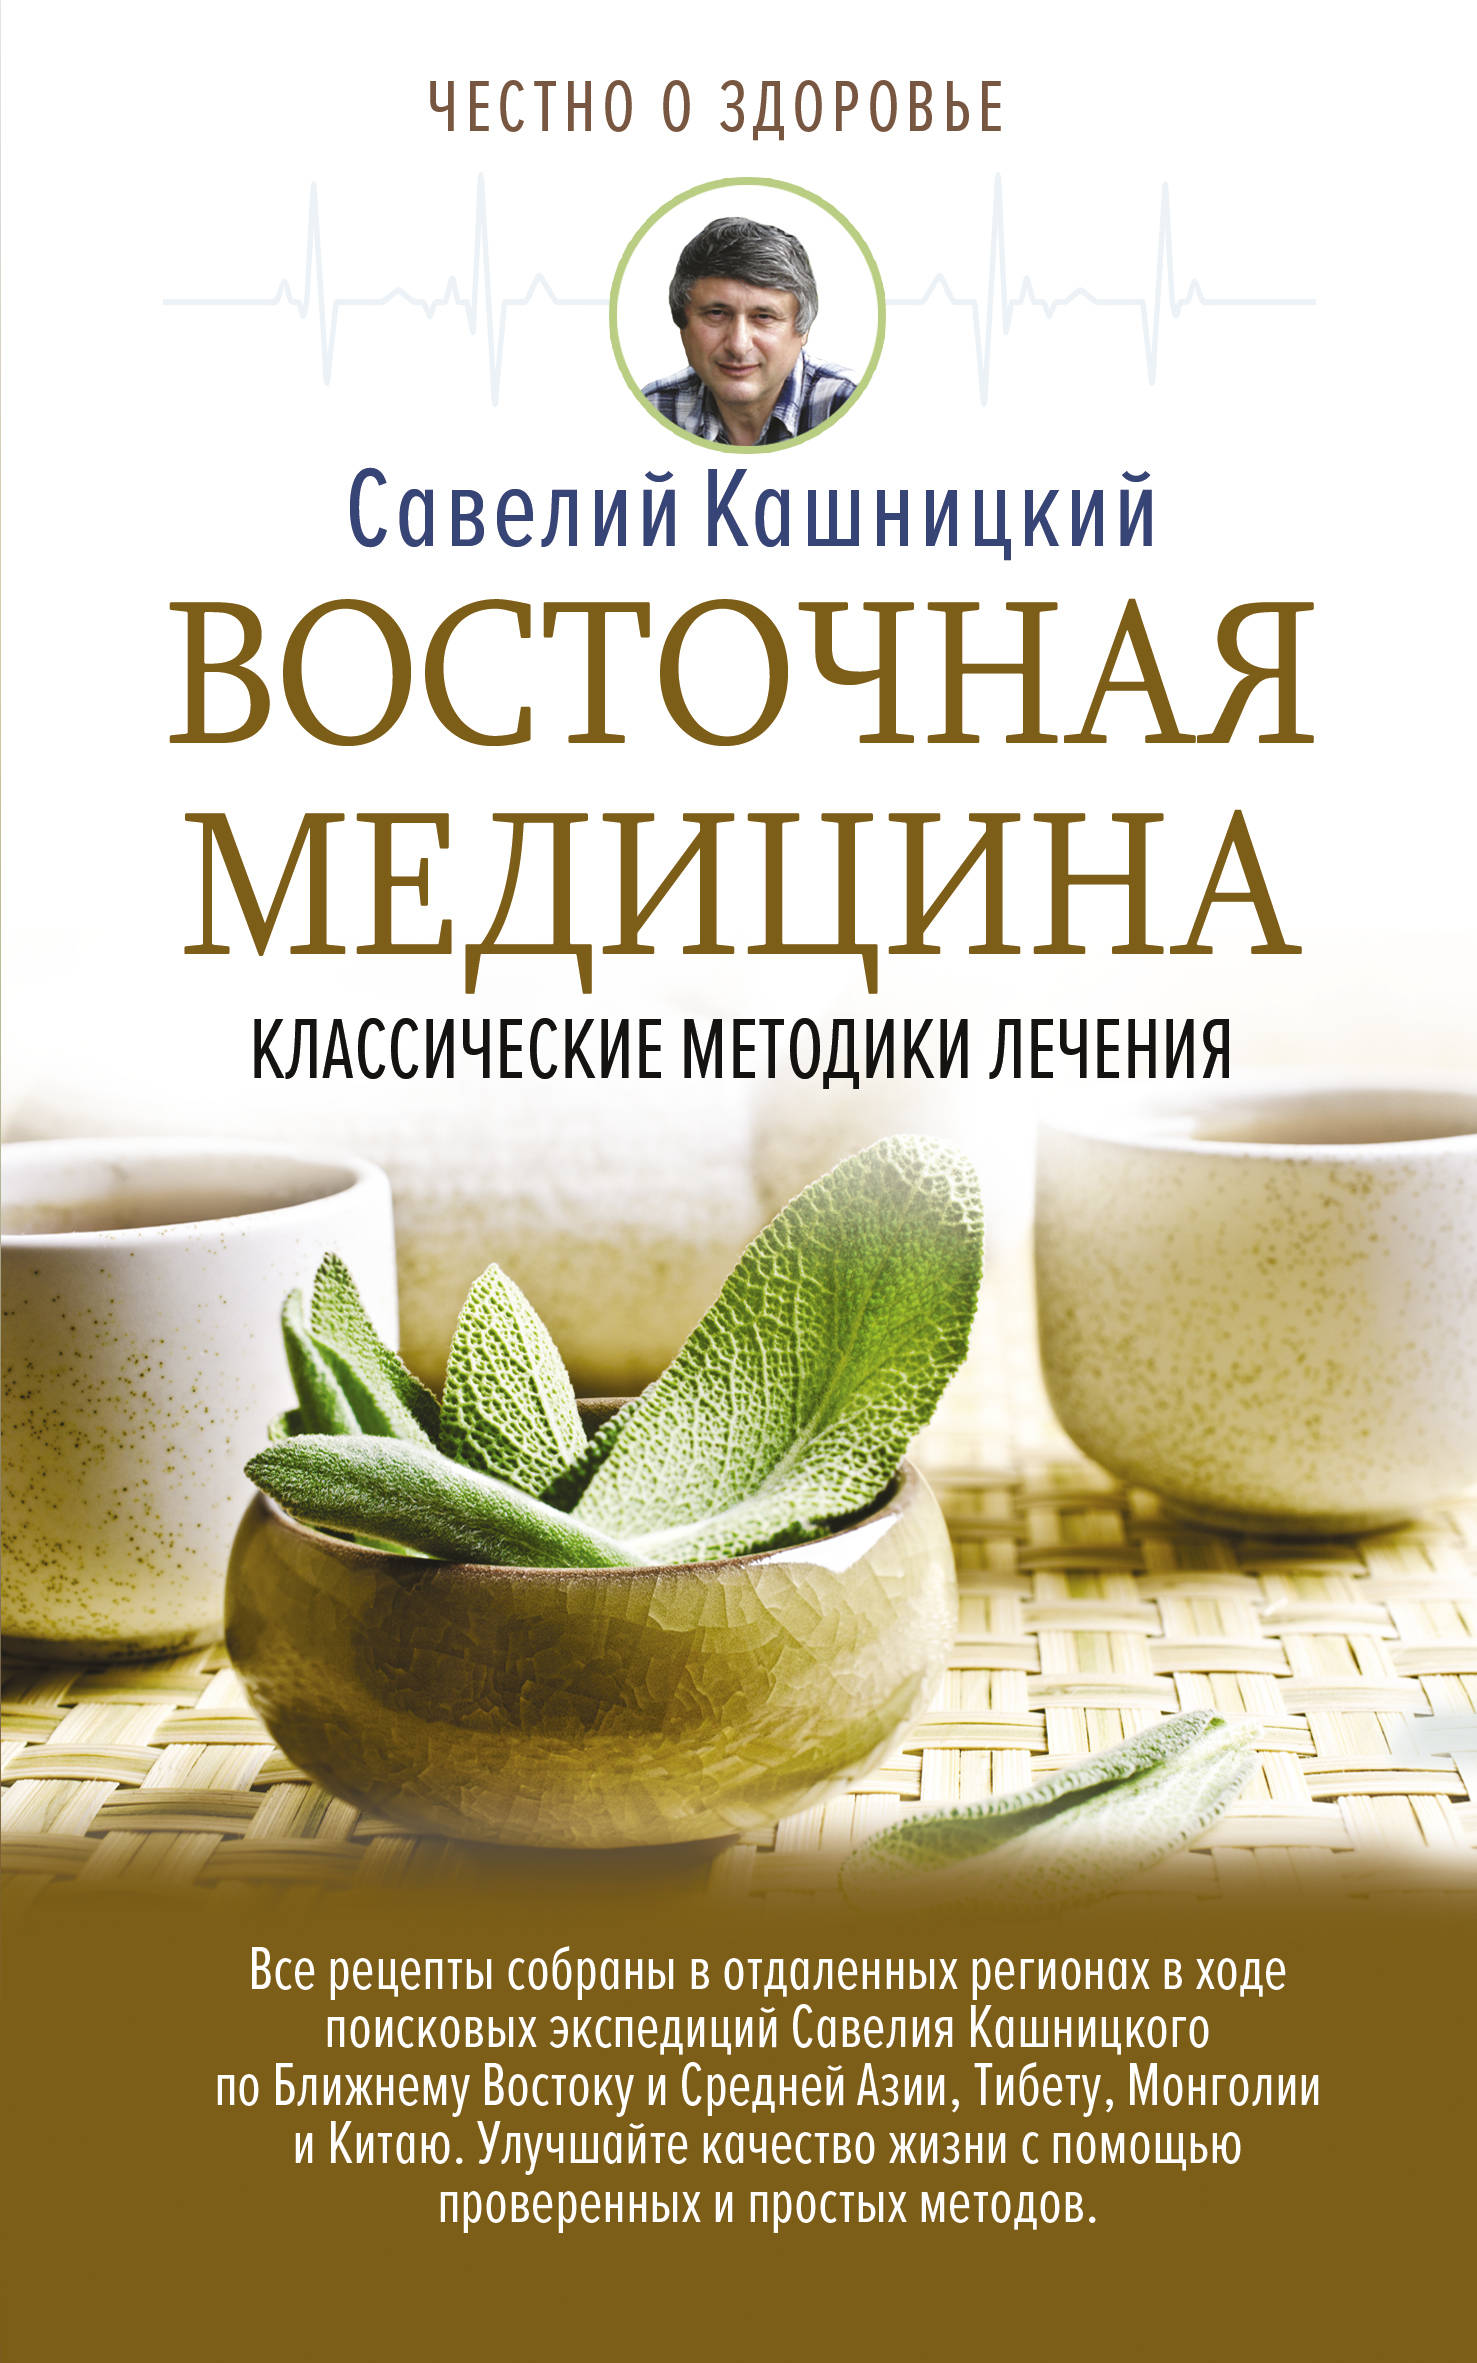 Восточная медицина: классические методики лечения